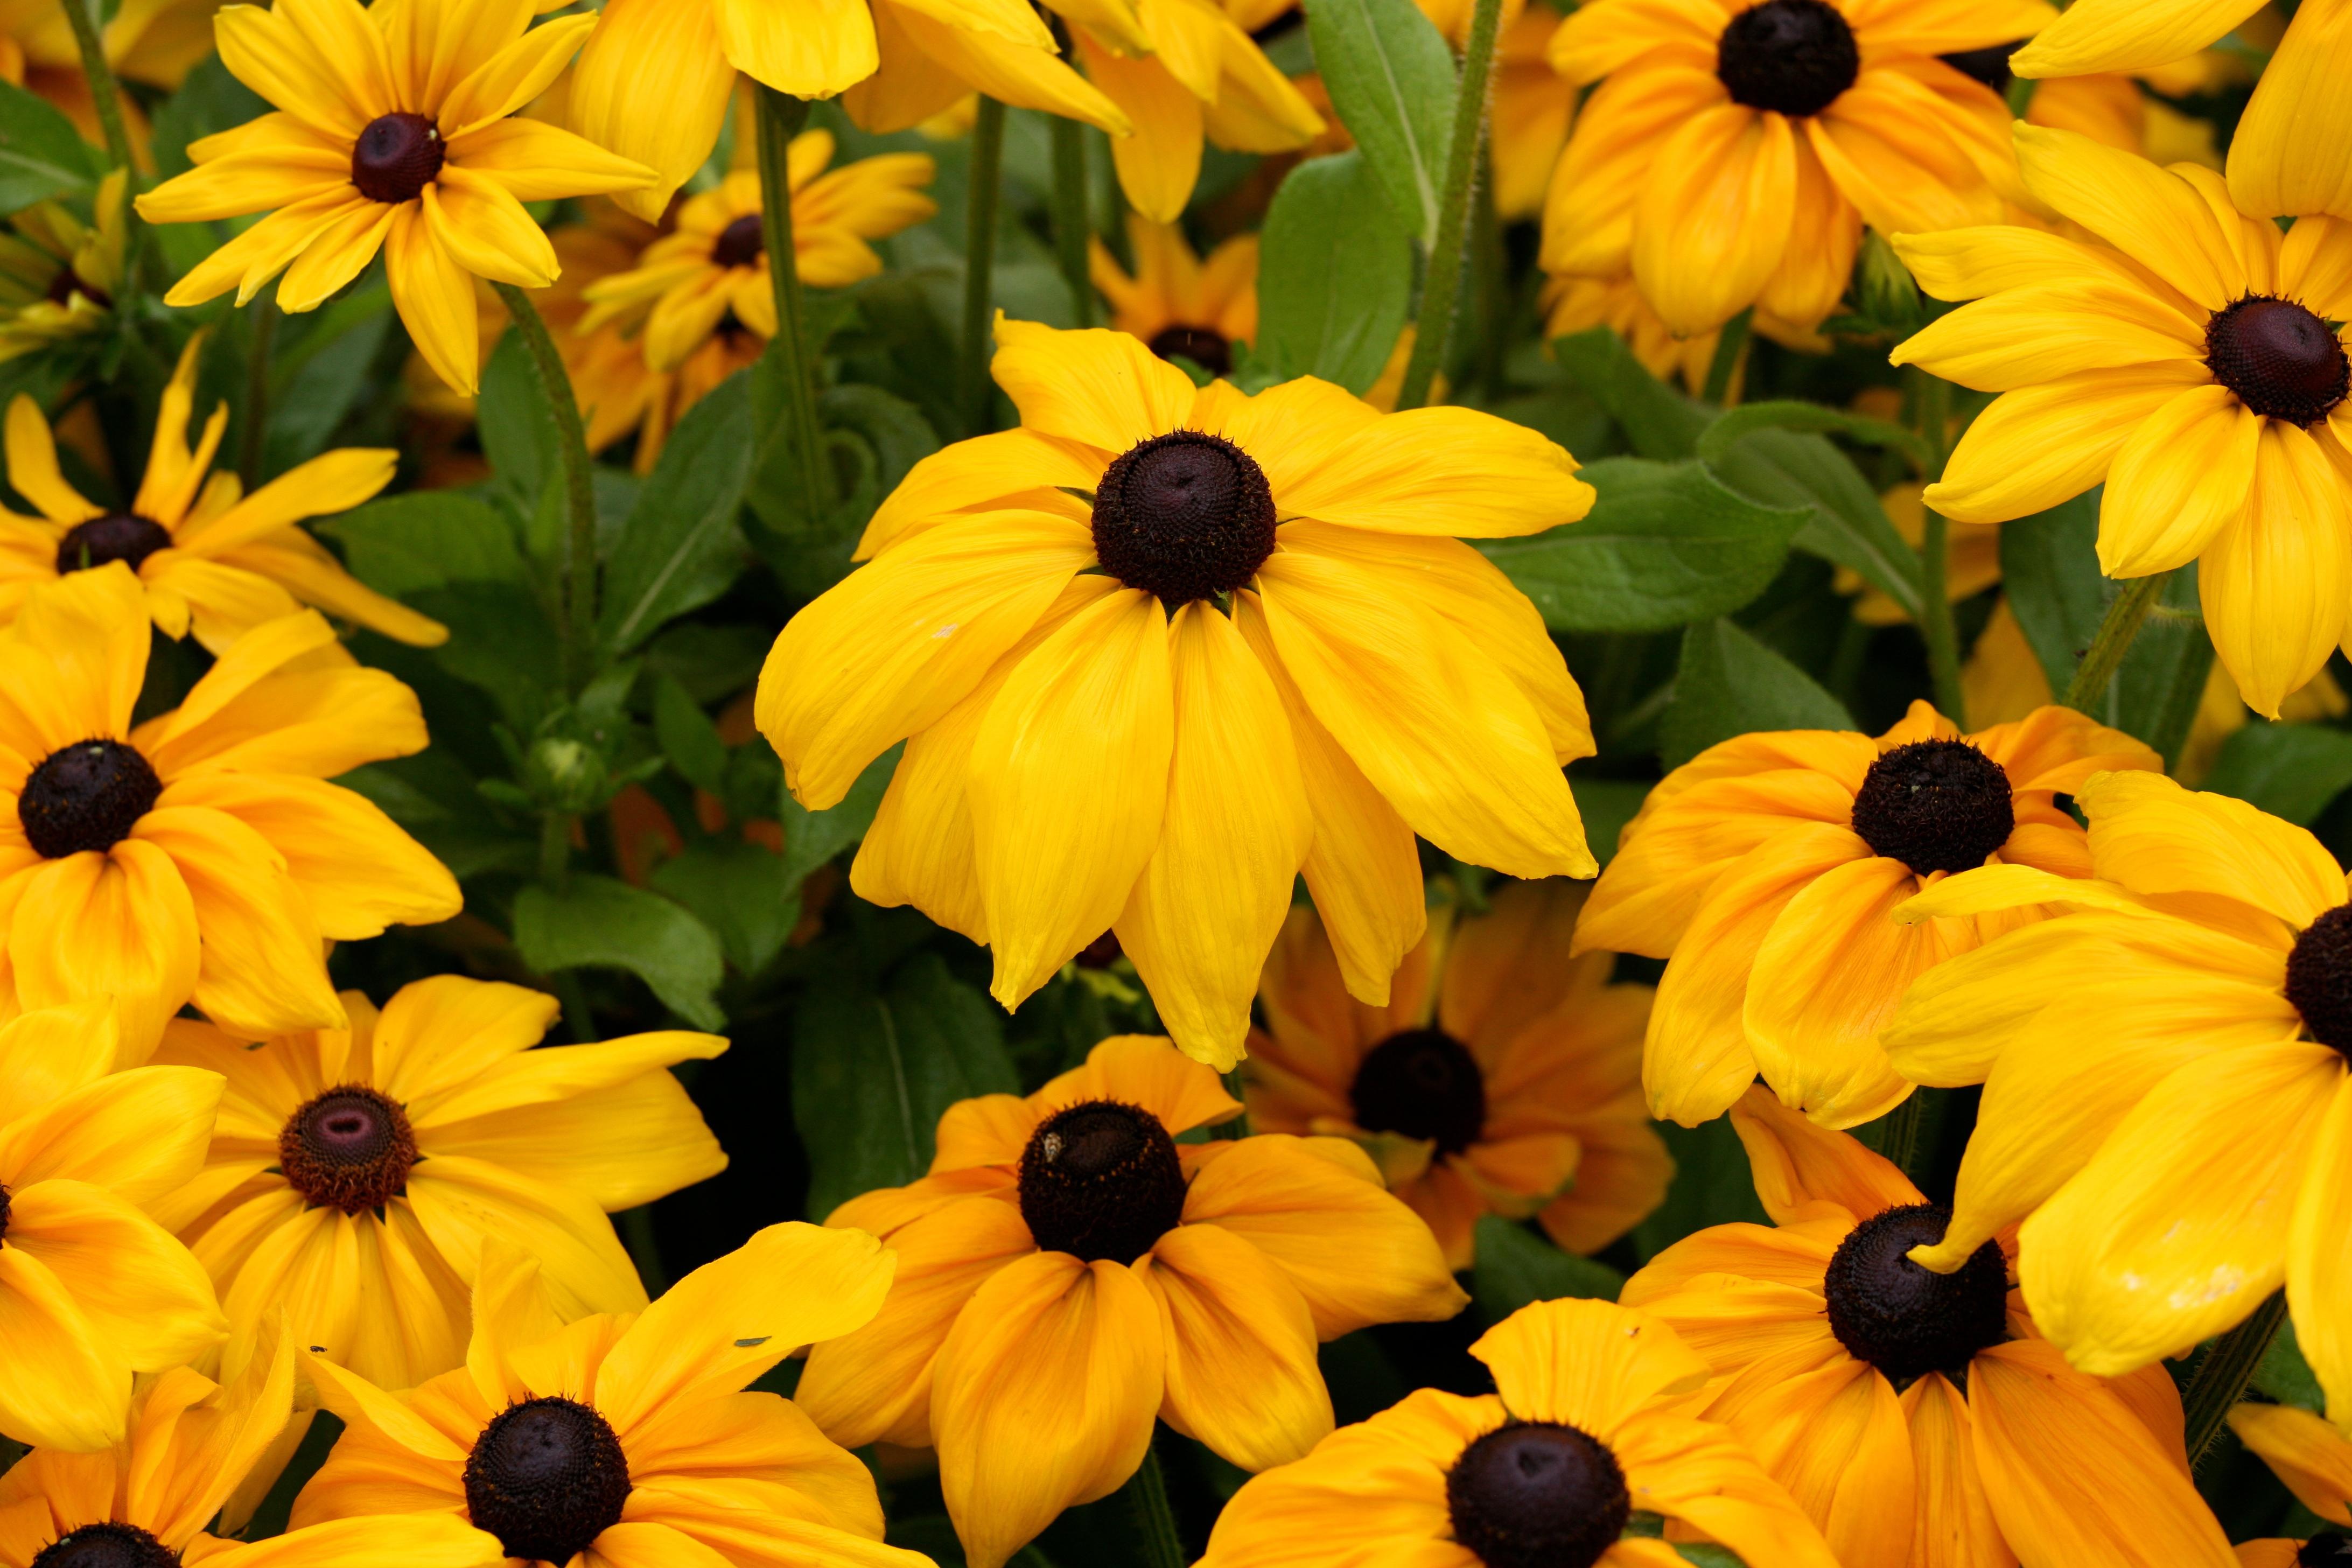 File:Yellow Flowers (5982179610).jpg - Wikimedia Commons